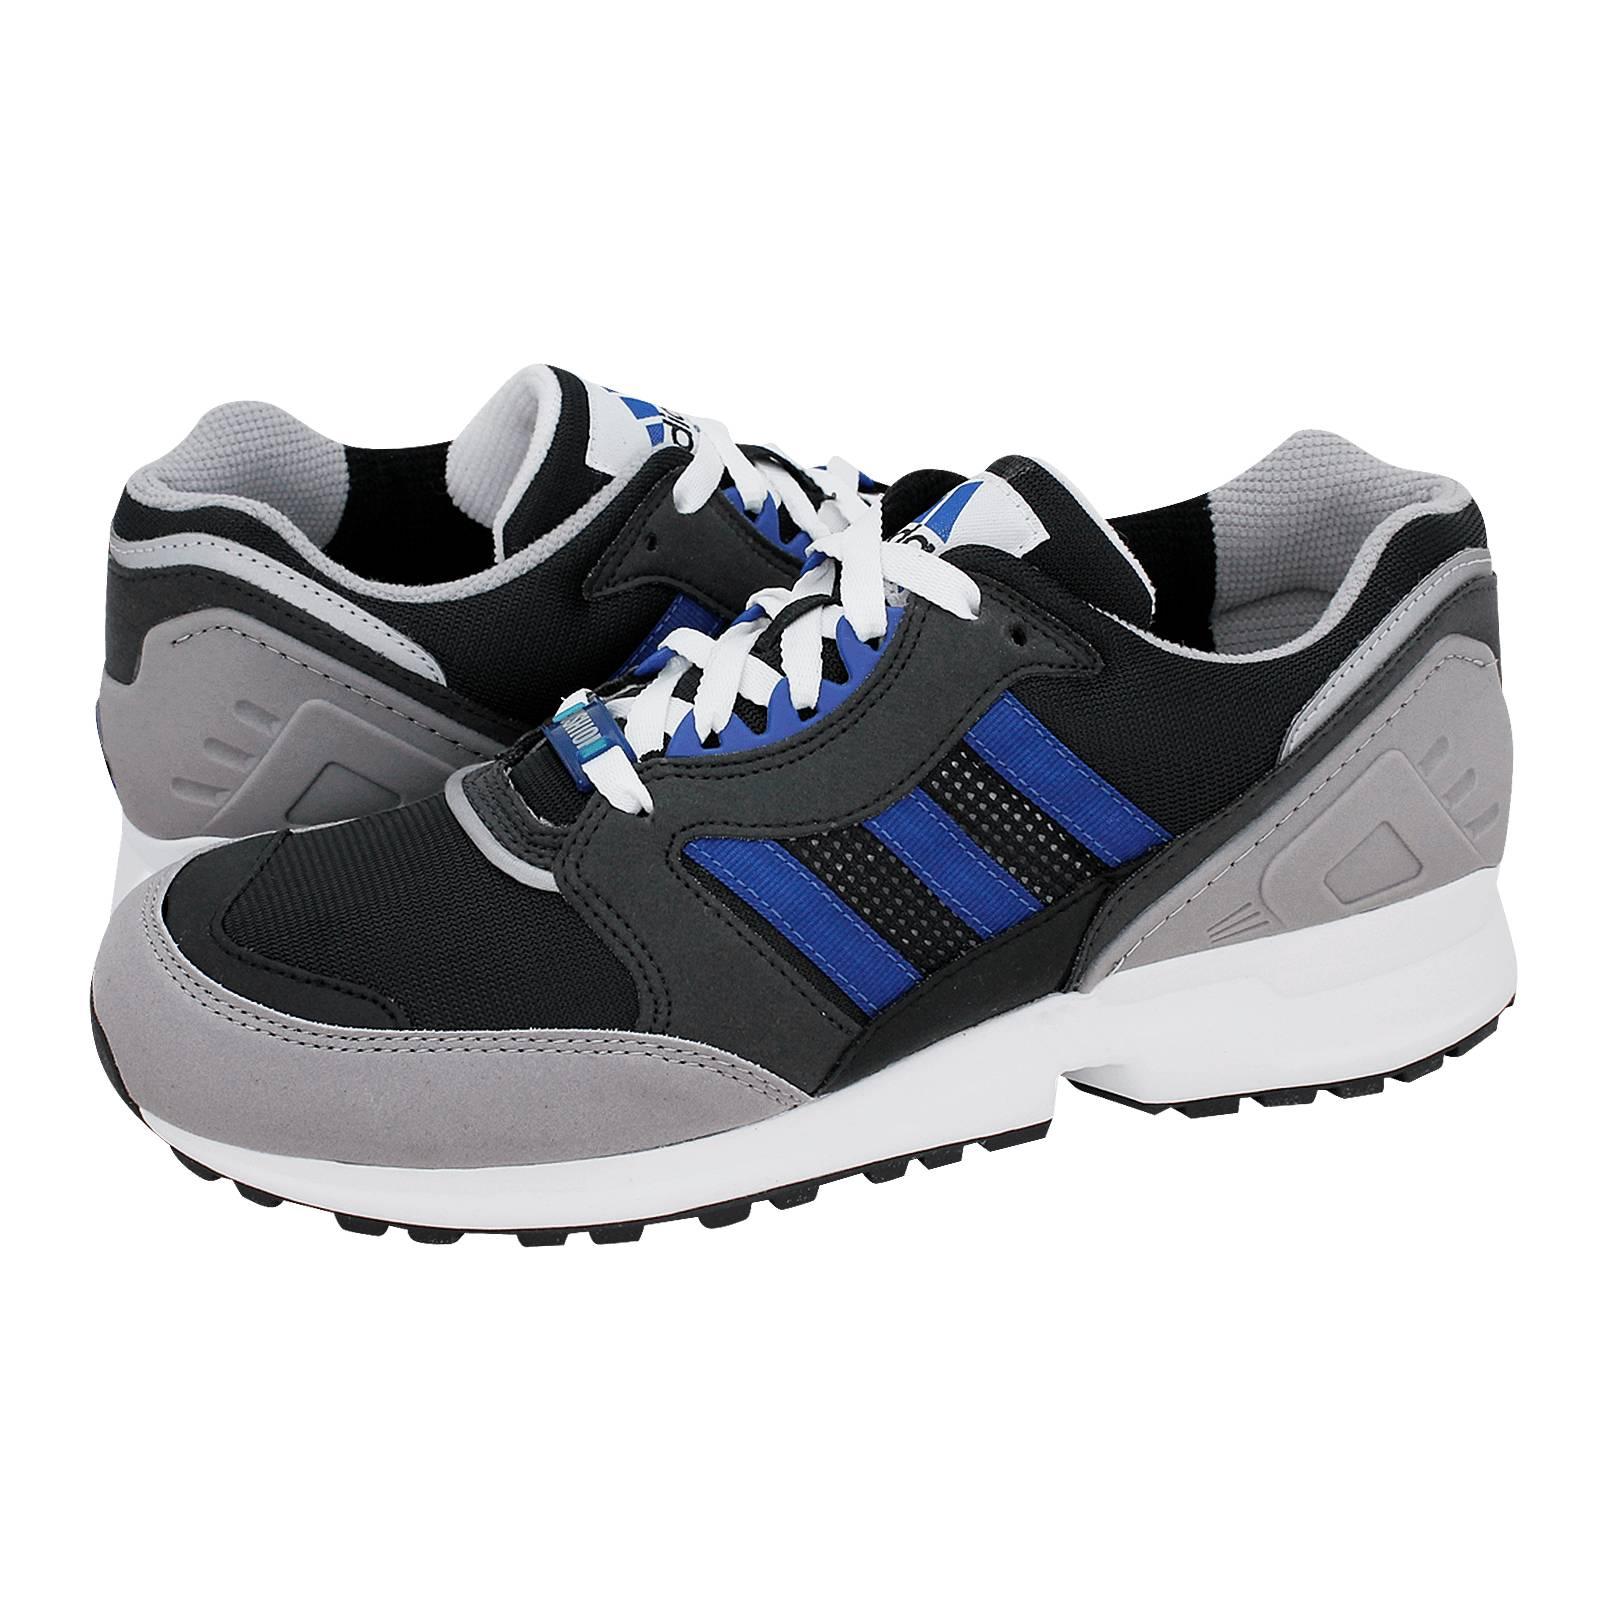 Equipment Running Cushion - Ανδρικά αθλητικά παπούτσια Adidas από ... 8e3236c7add